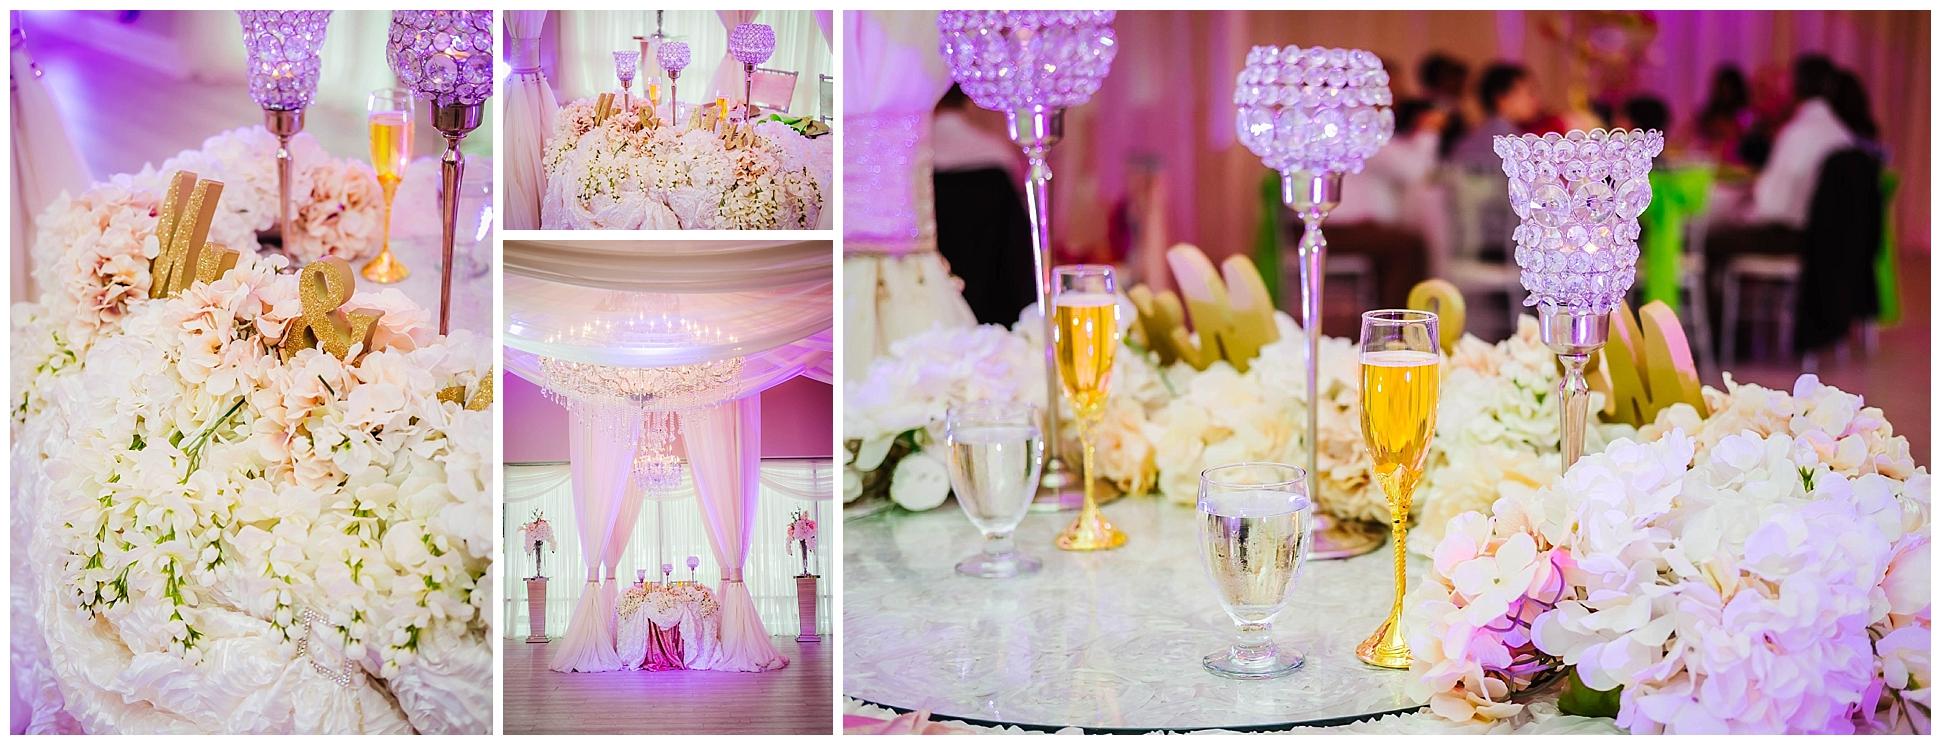 st-pete-wedding-photographer-sunken-gardens-crystal-ballroom-princess-dancer_0177.jpg